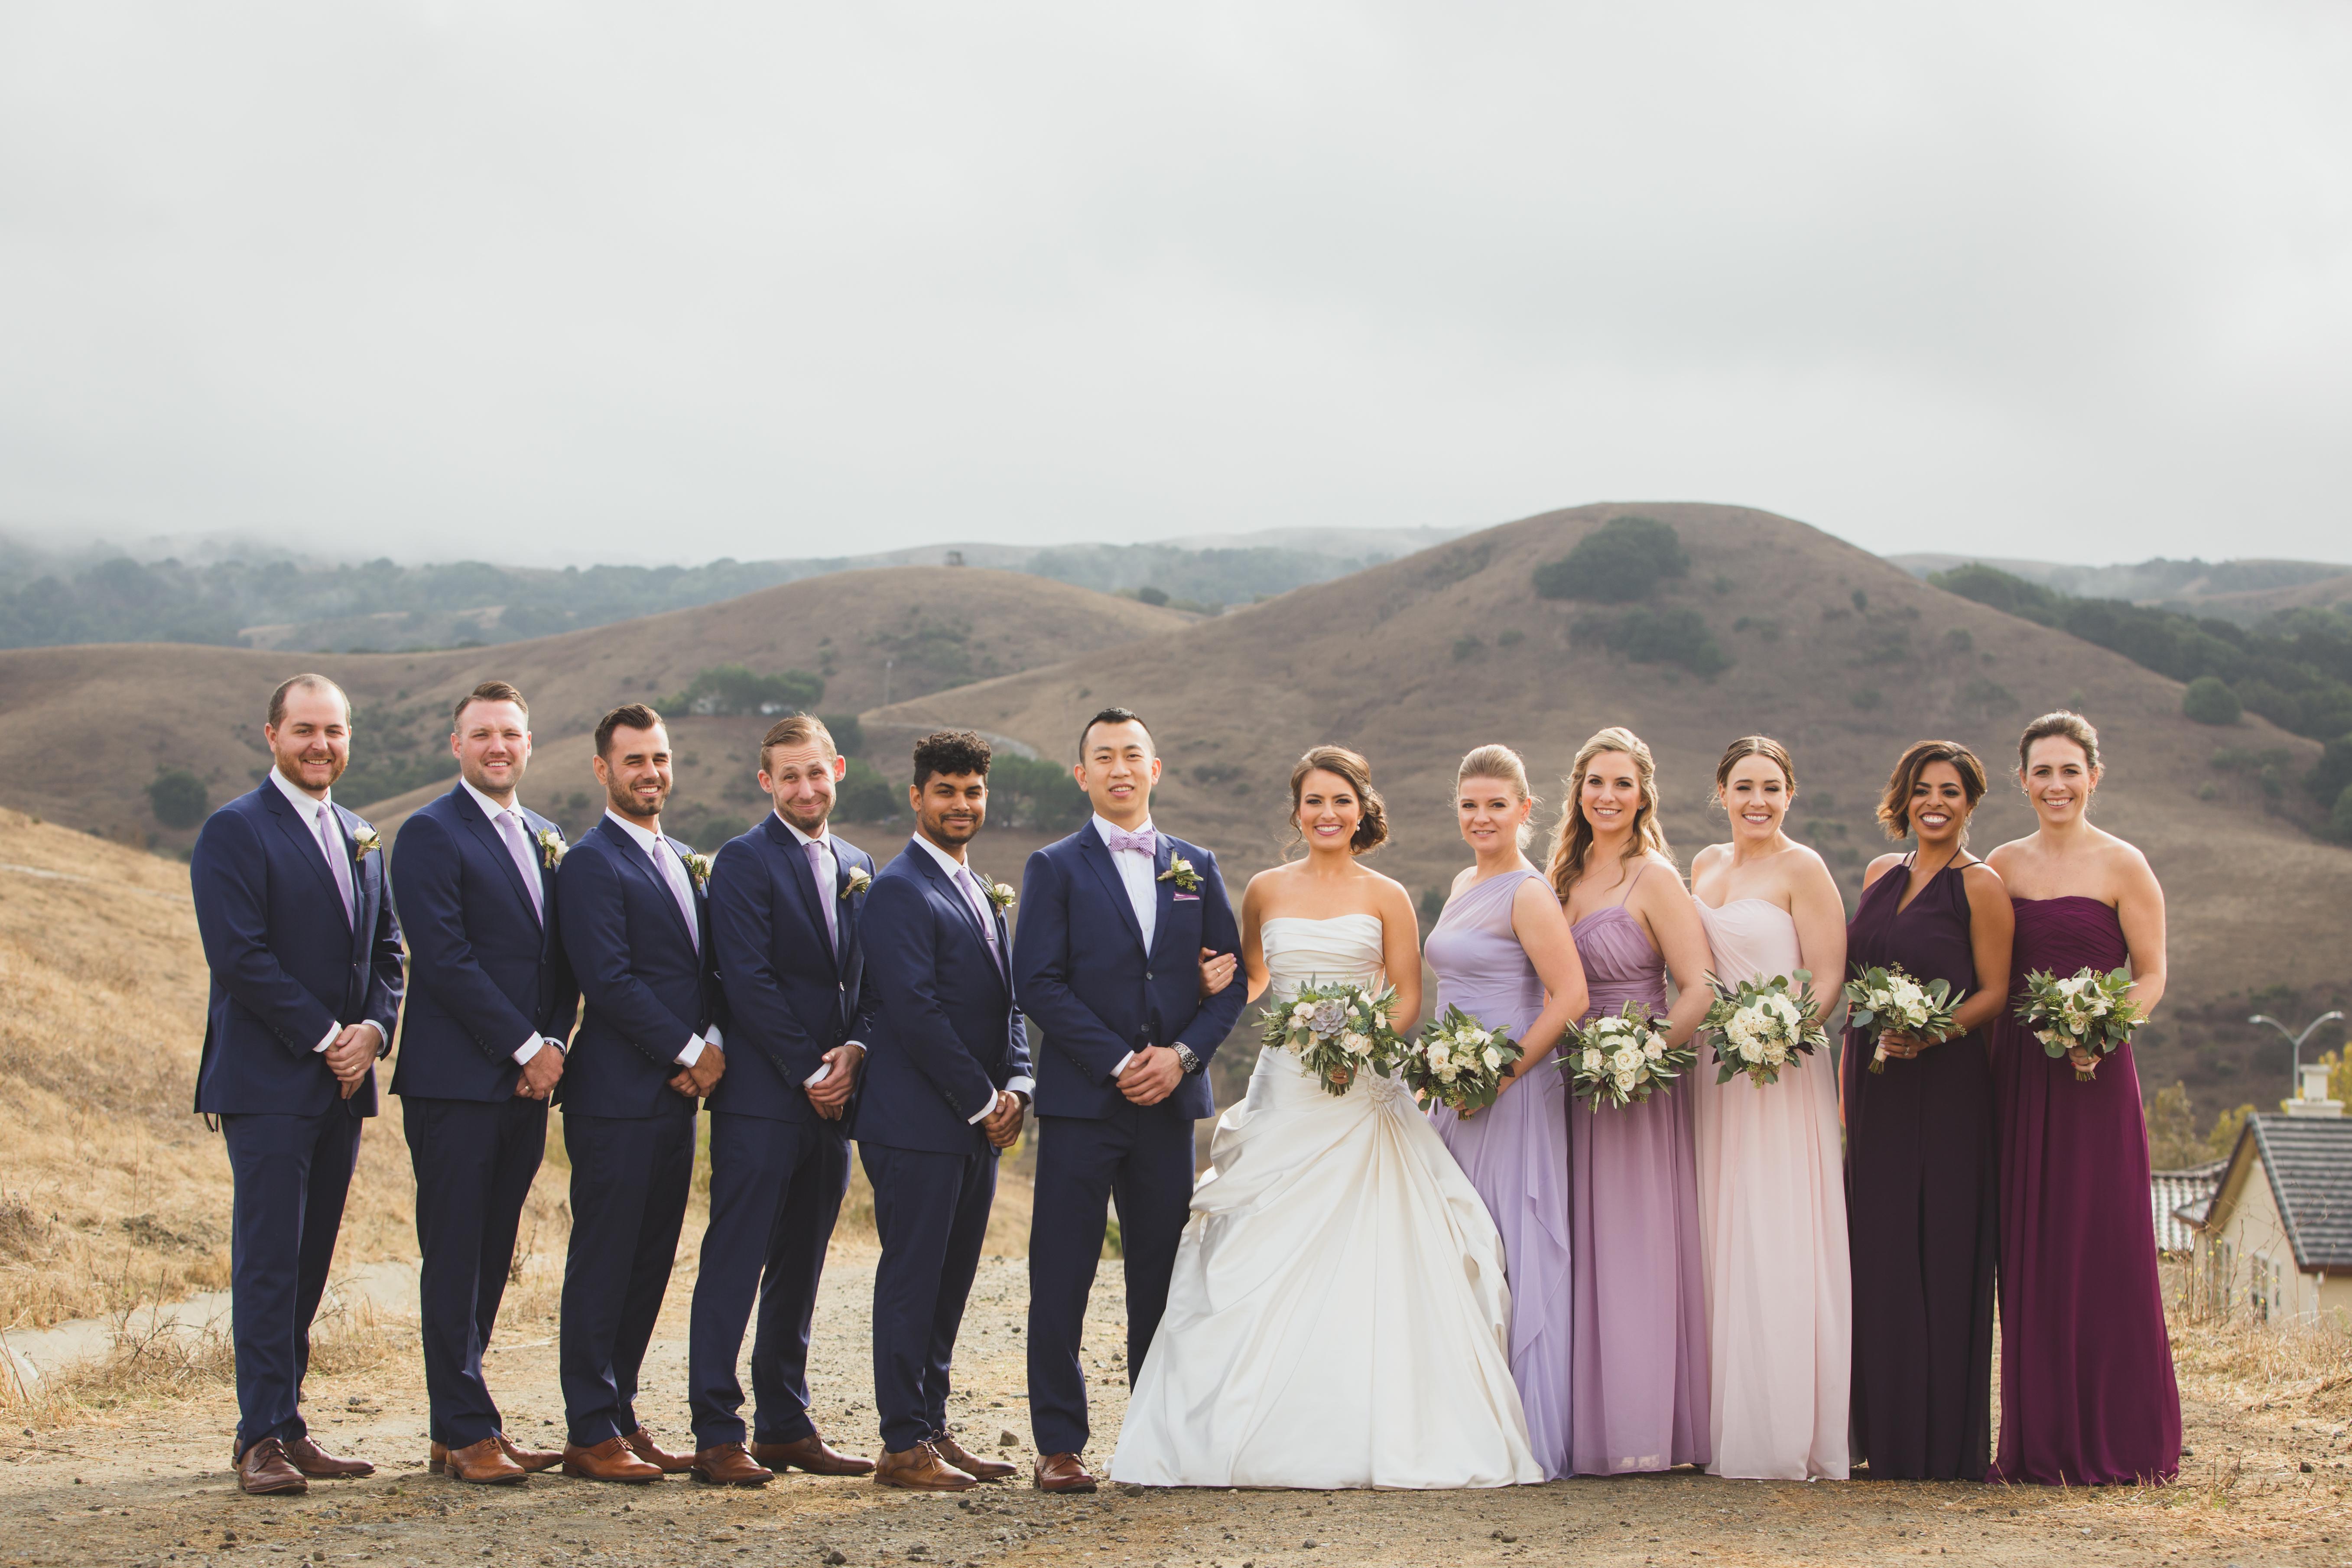 Robert and Kelsey - Real Weddings by The Groomsman Suit